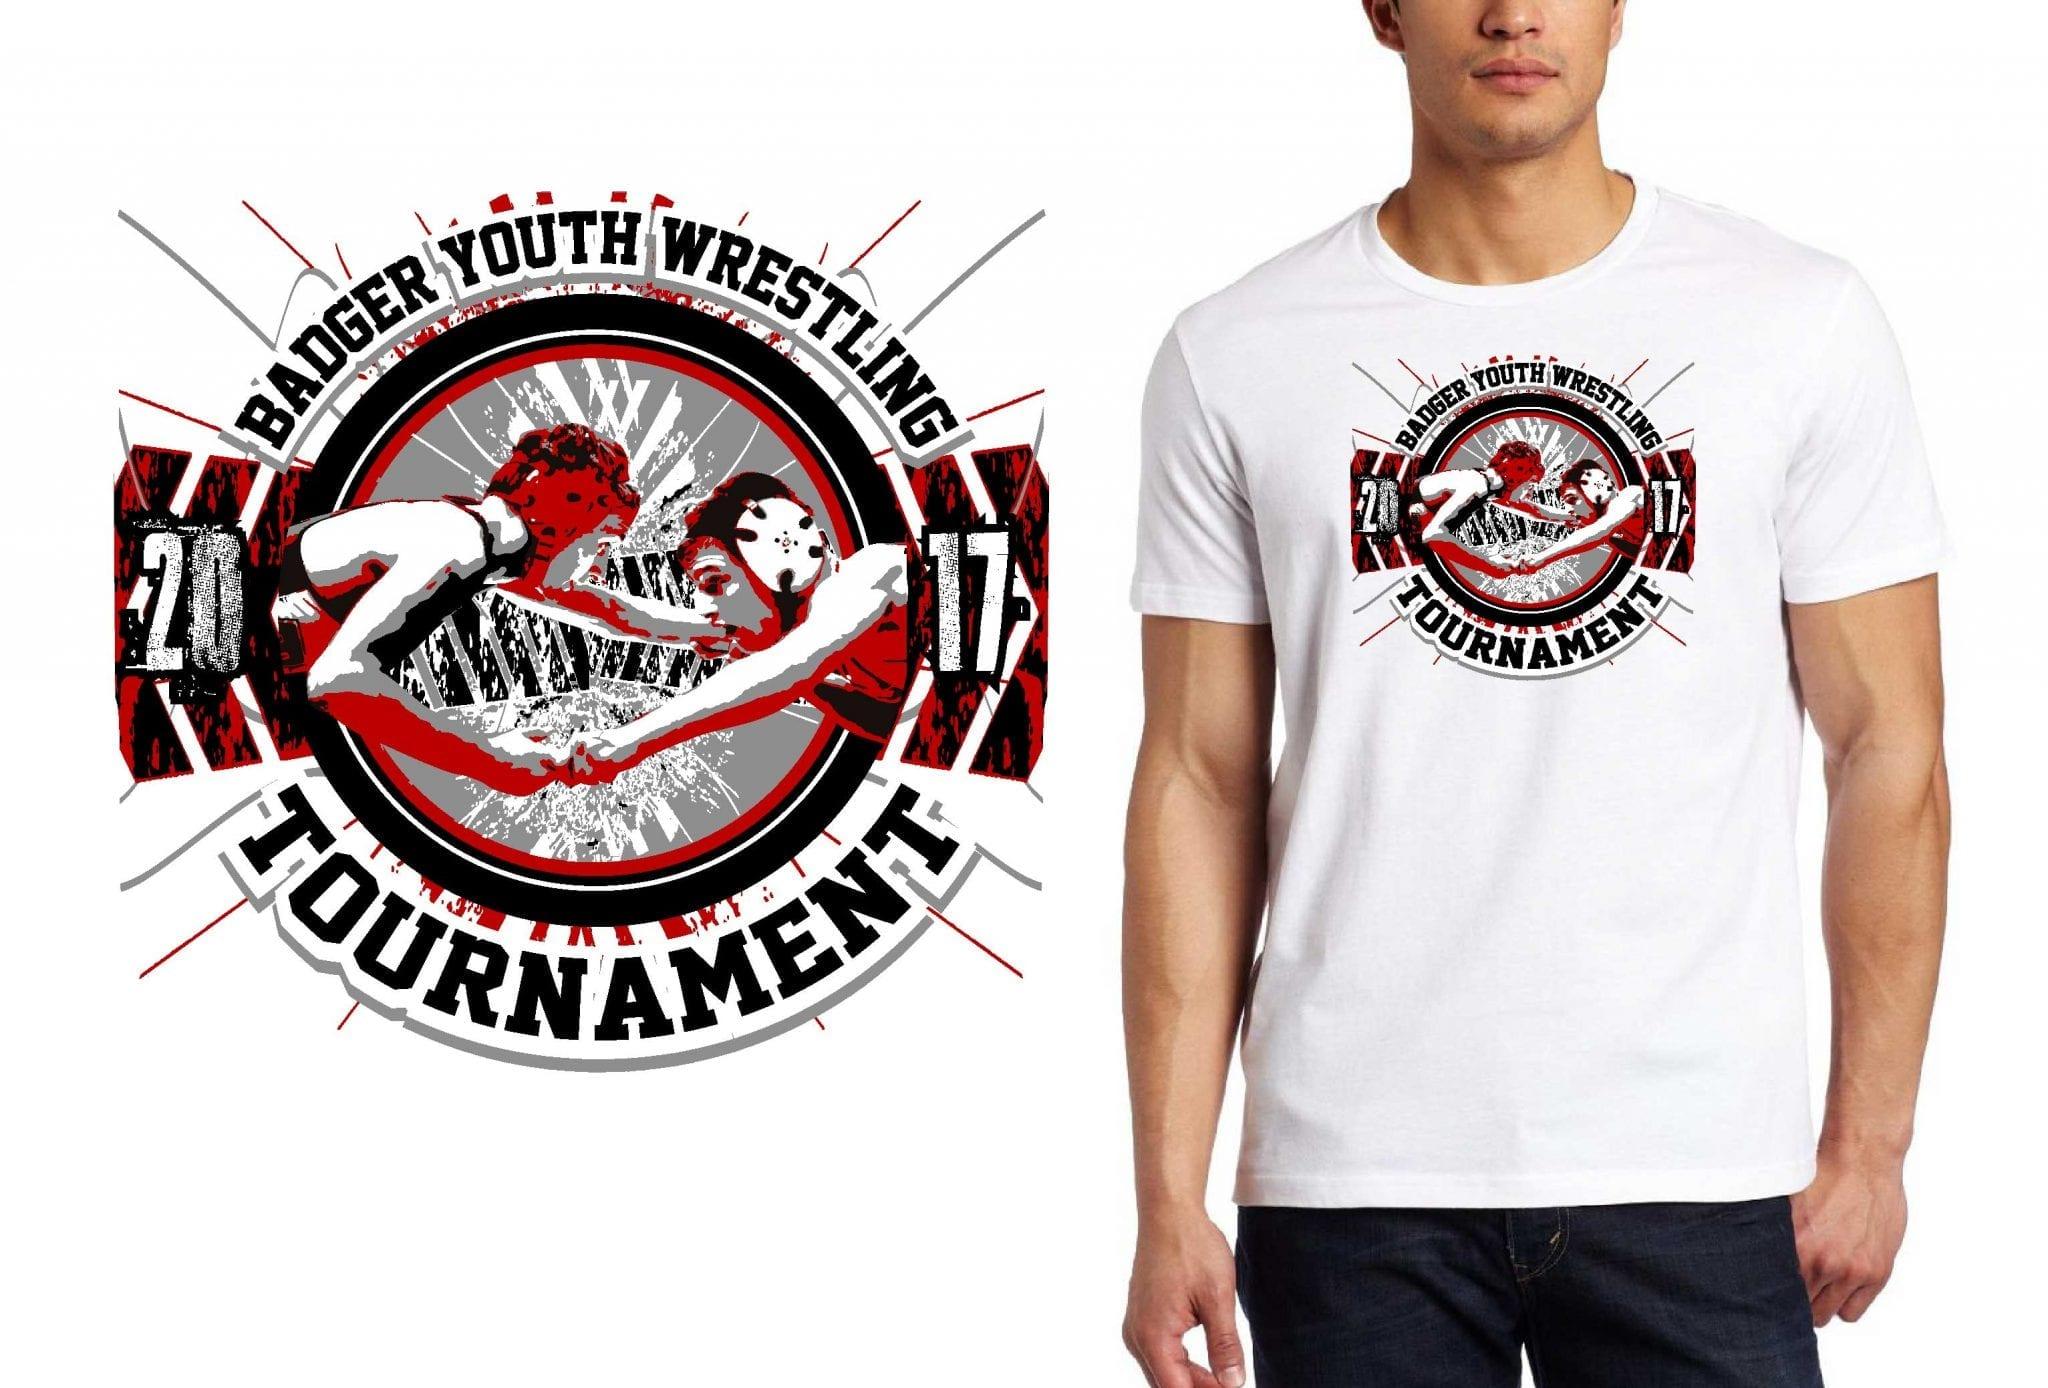 WRESTLING T SHIRT LOGO DESIGN Badger-Youth-Wrestling-Tournament BY UrArtStudio